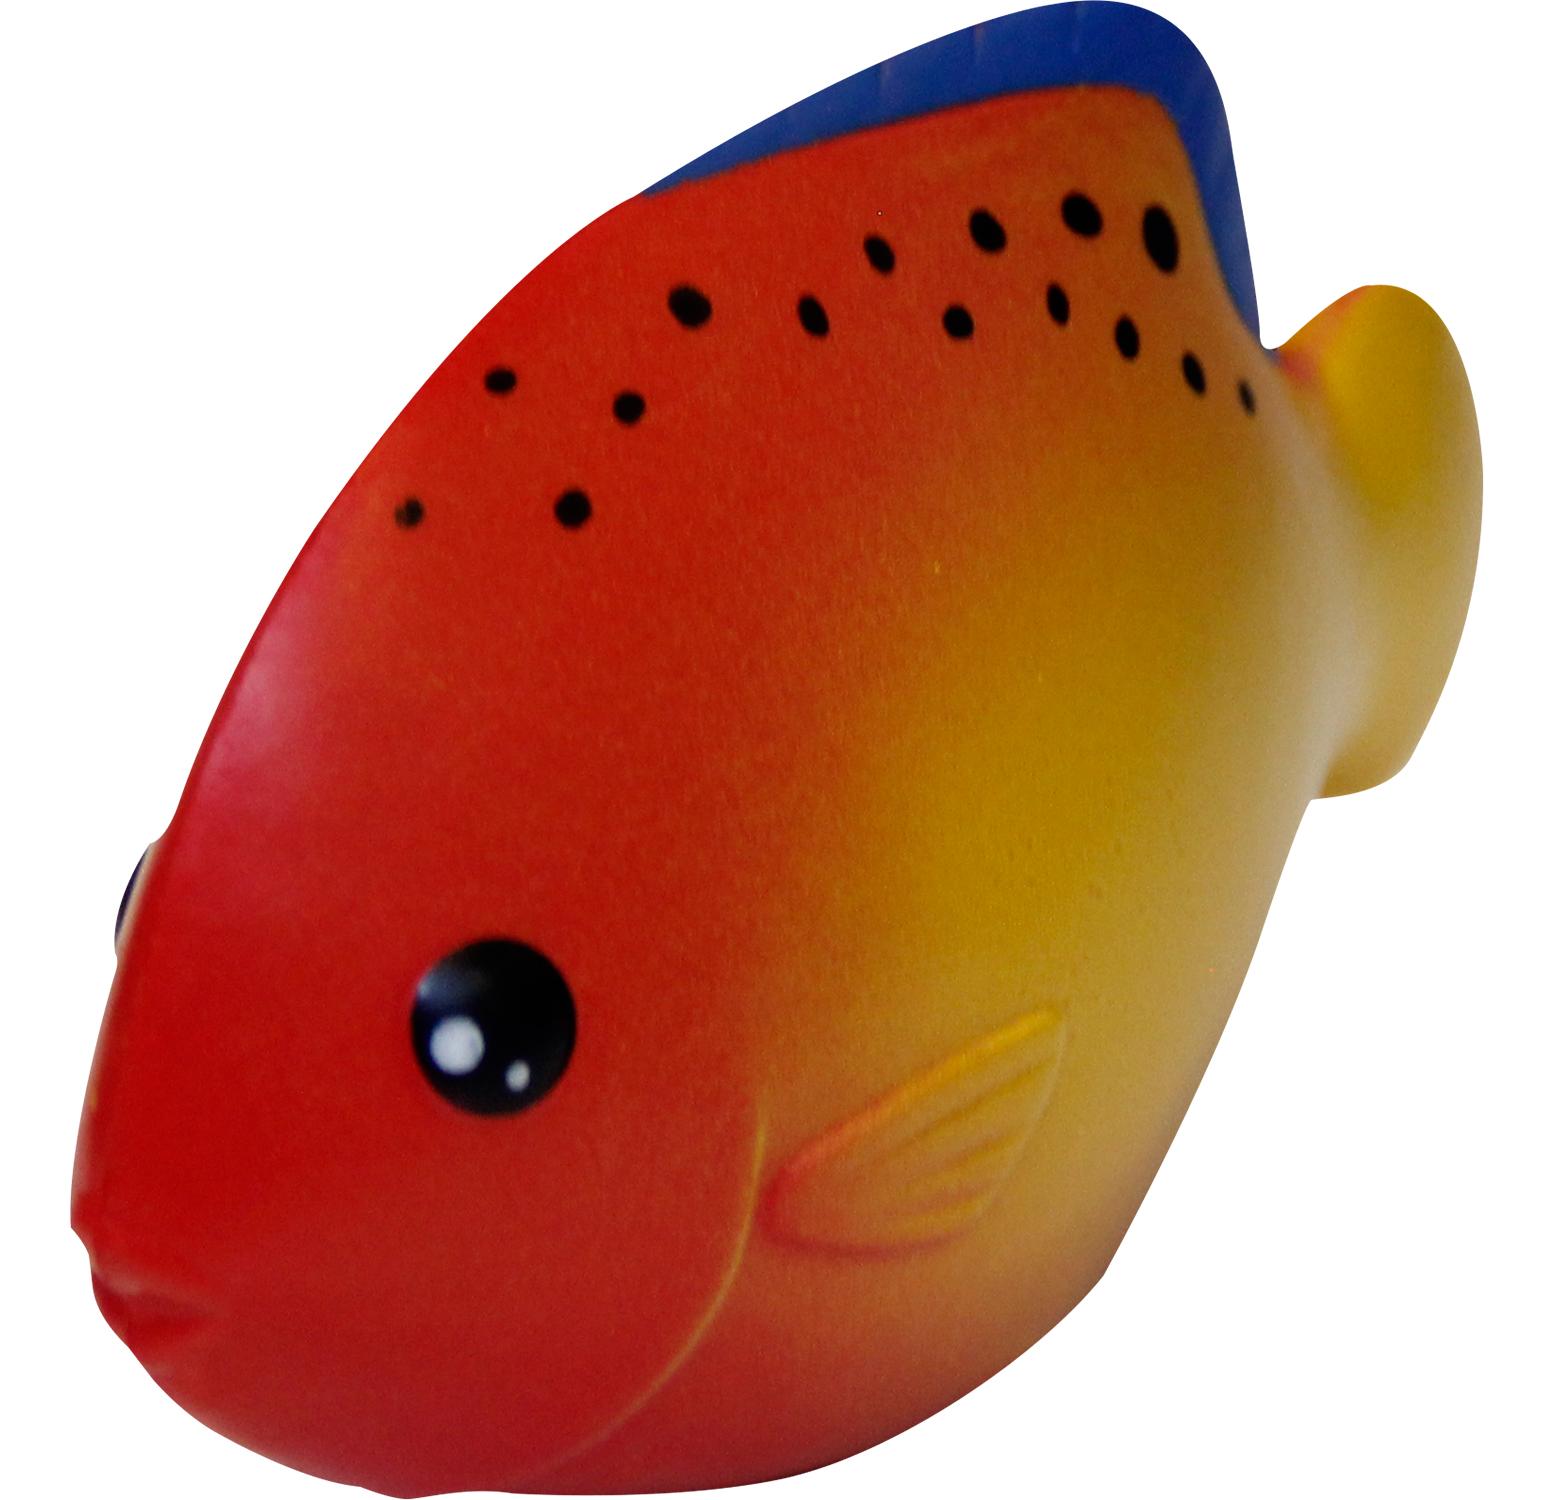 Pescado20Tropical20Anti-estres.jpg